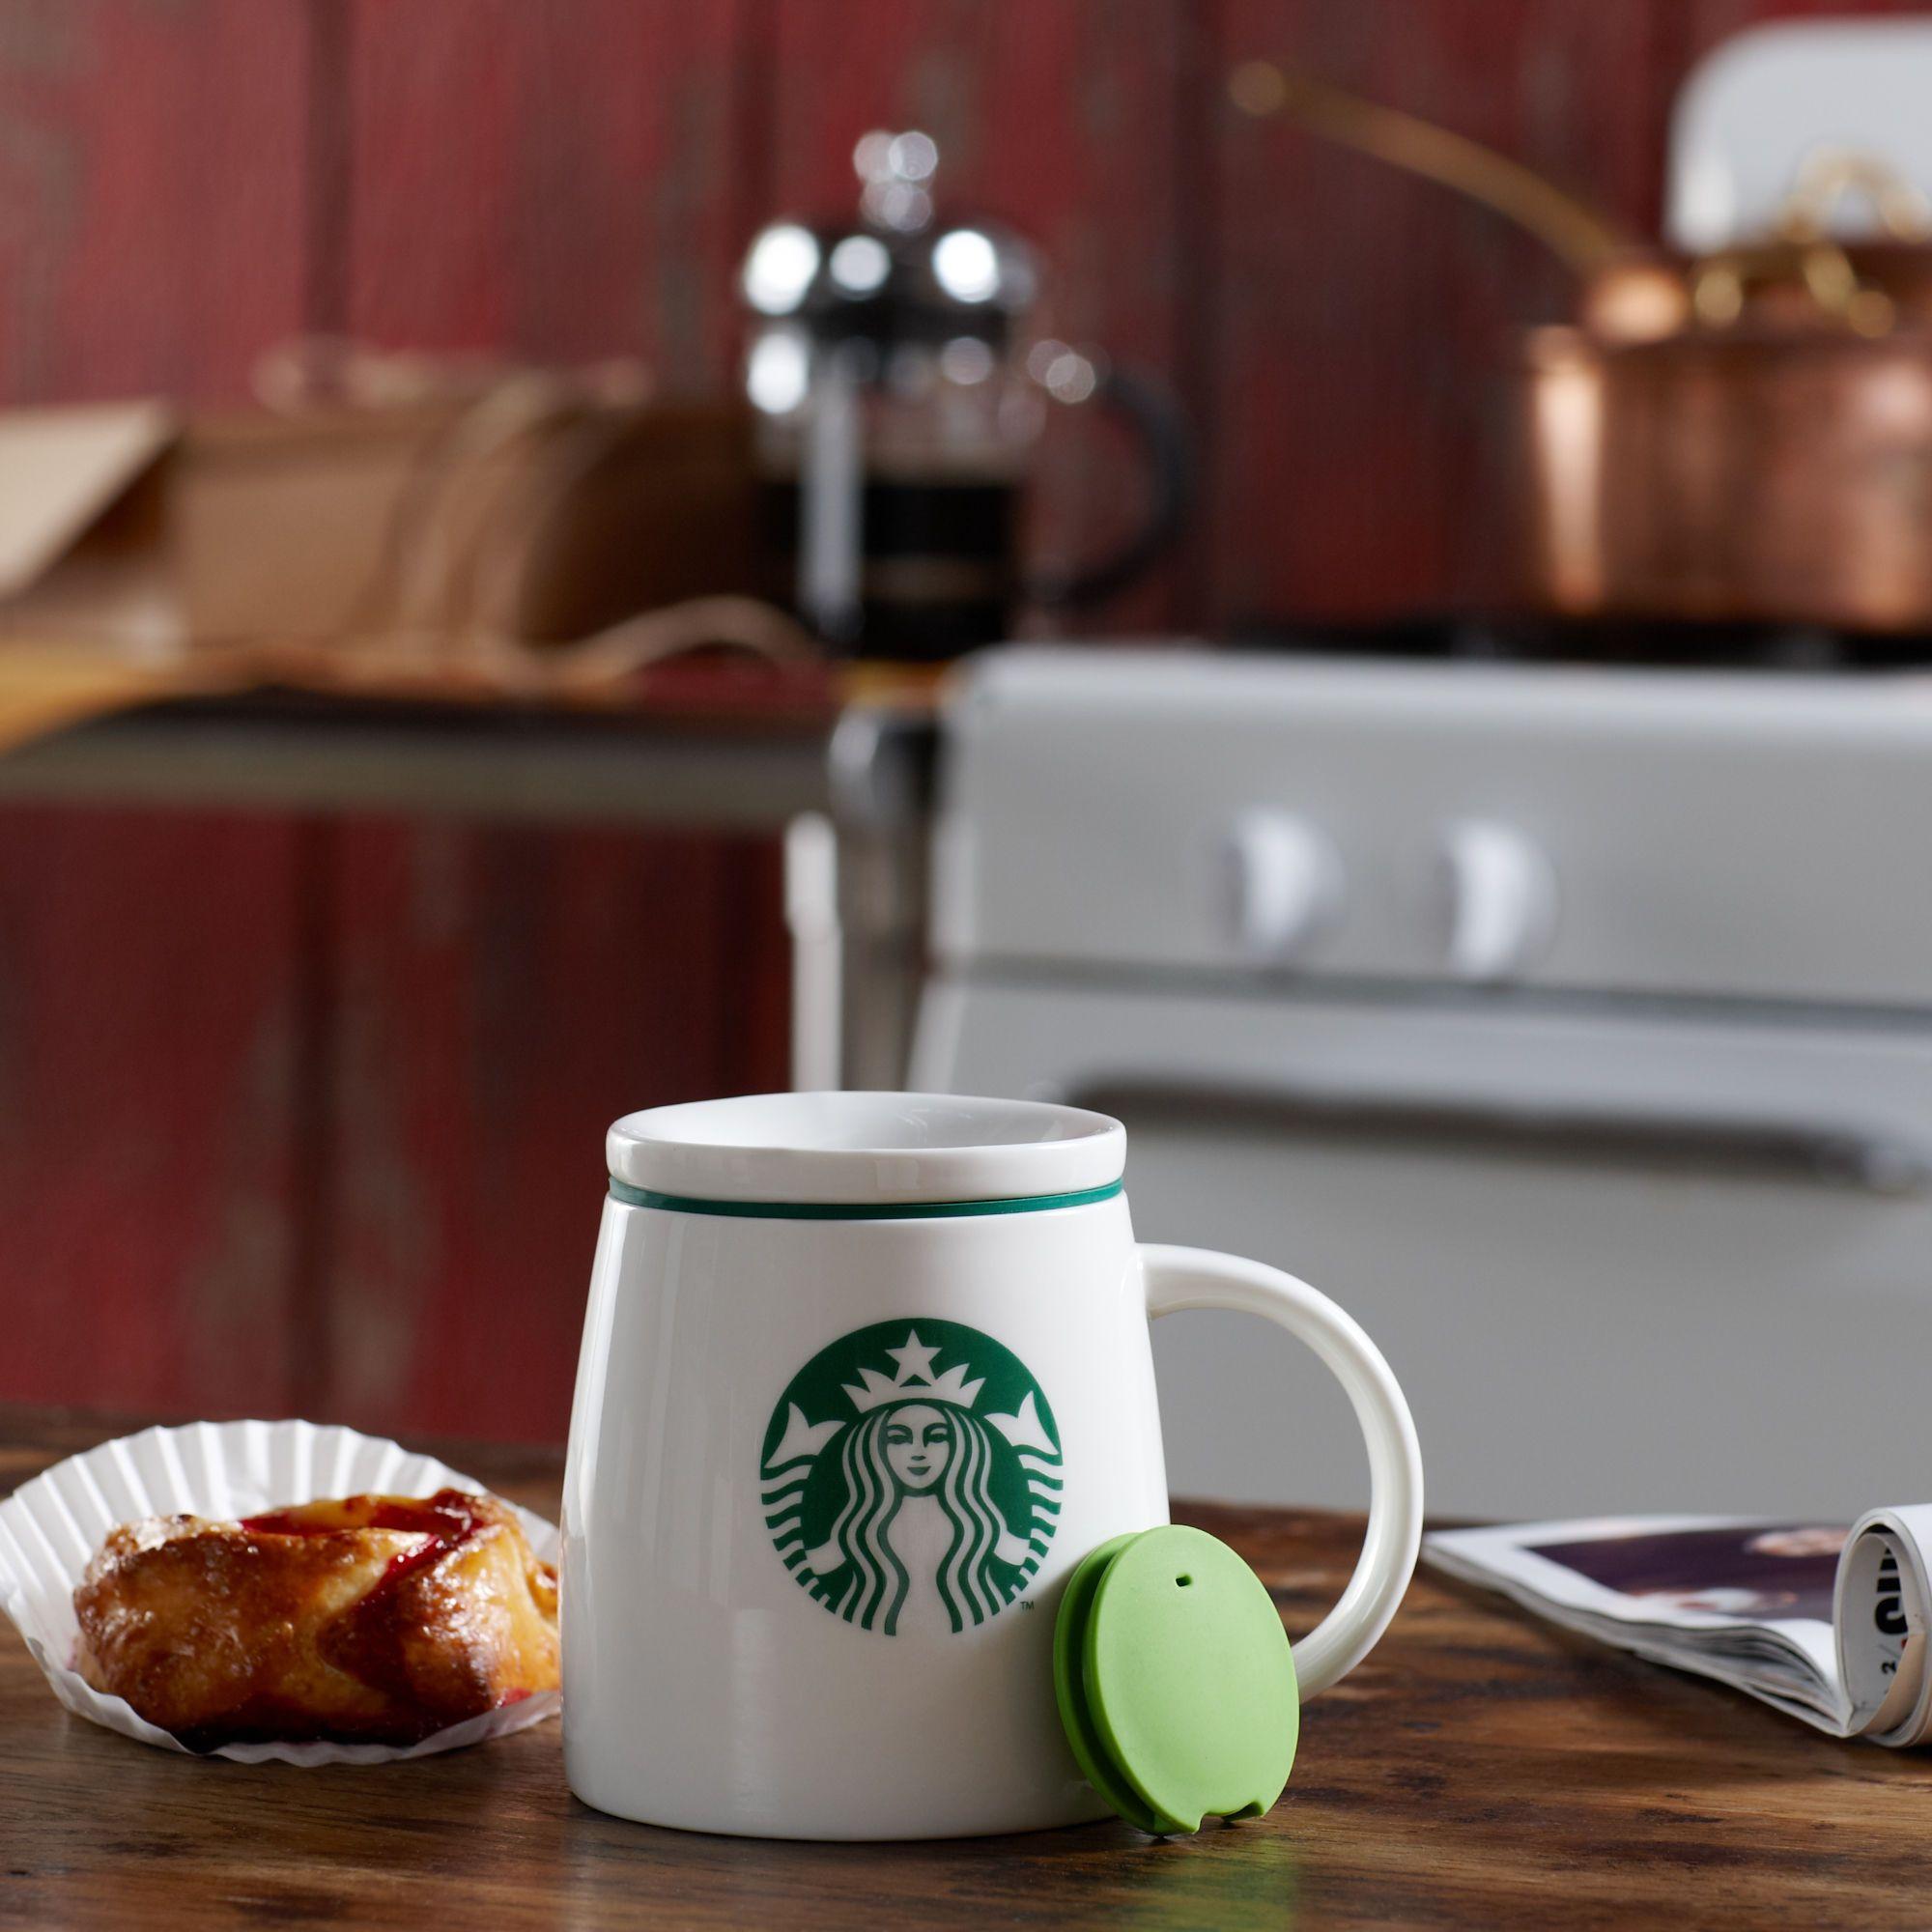 Starbucks® Ceramic Mug with Lid, 14 fl oz. To always keep